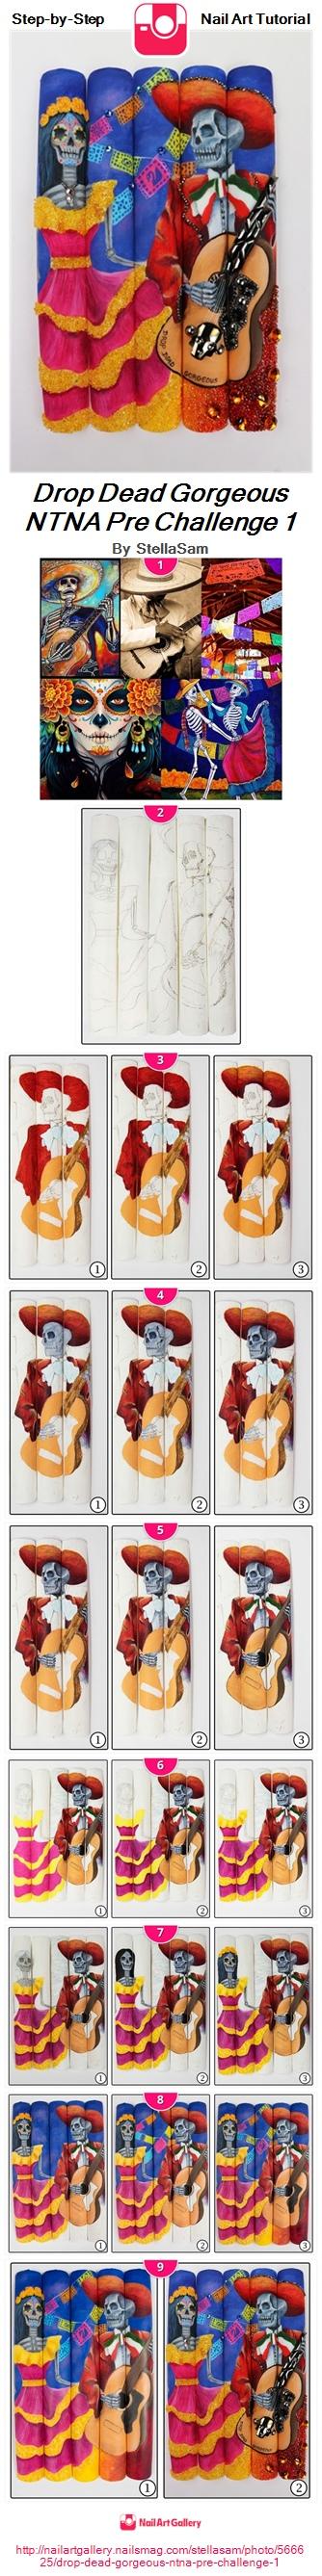 Drop Dead Gorgeous NTNA Pre Challenge 1 - Nail Art Gallery